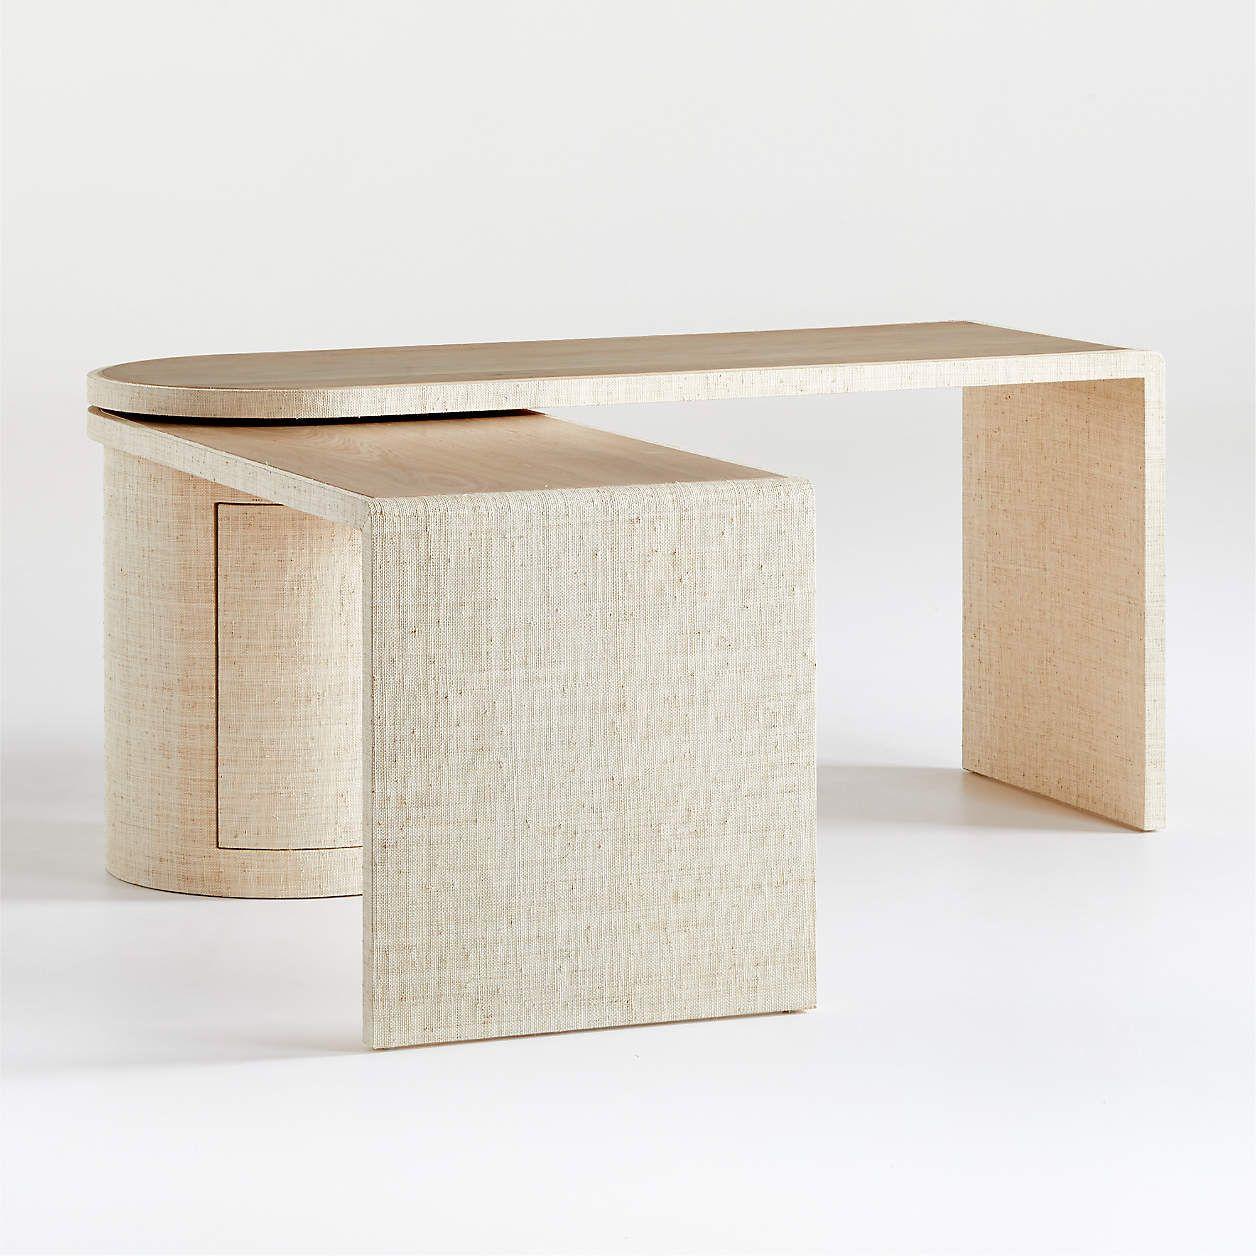 Twist Rotating Desk Reviews Crate And Barrel In 2021 Crate And Barrel Retail Interior Design Interior Inspo